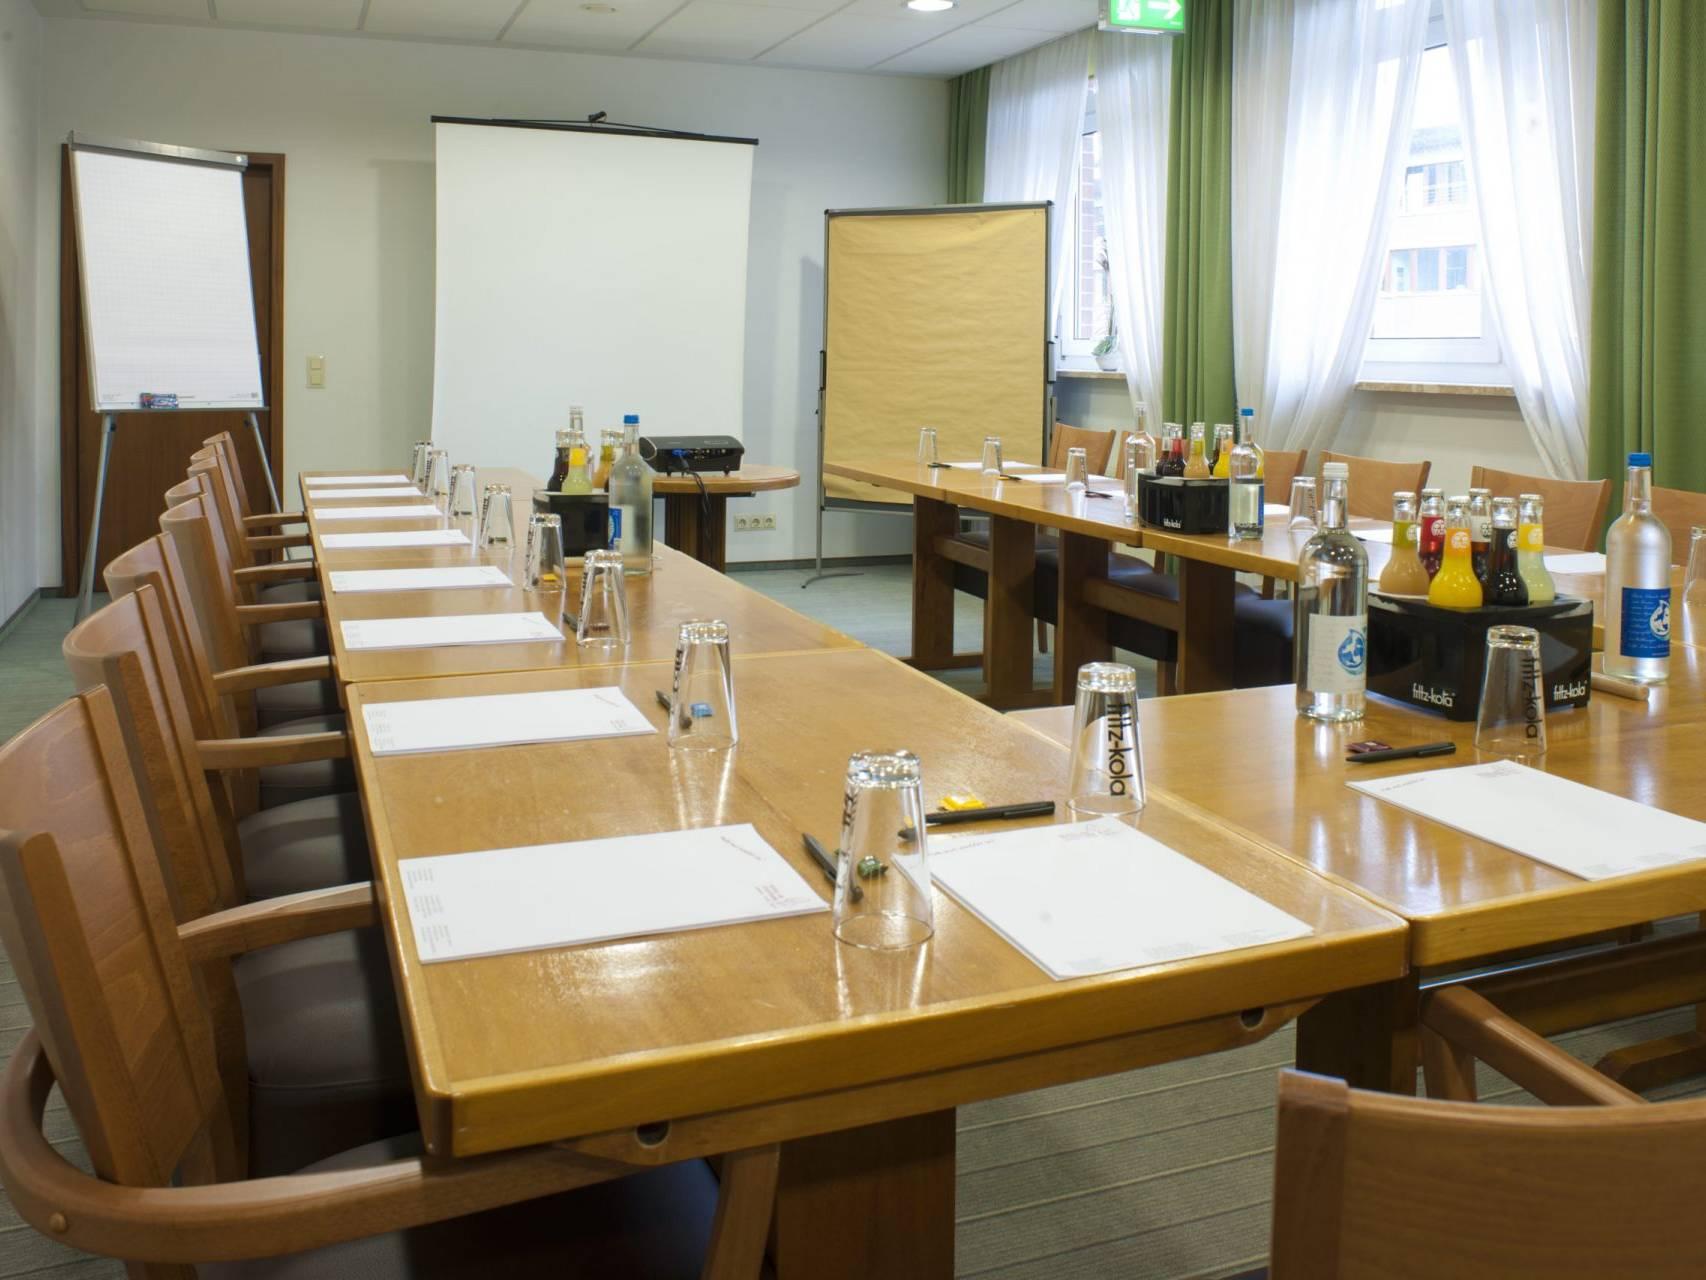 Konferenzraum Hotel am Stadtpark Buxtehude 2 scaled uai